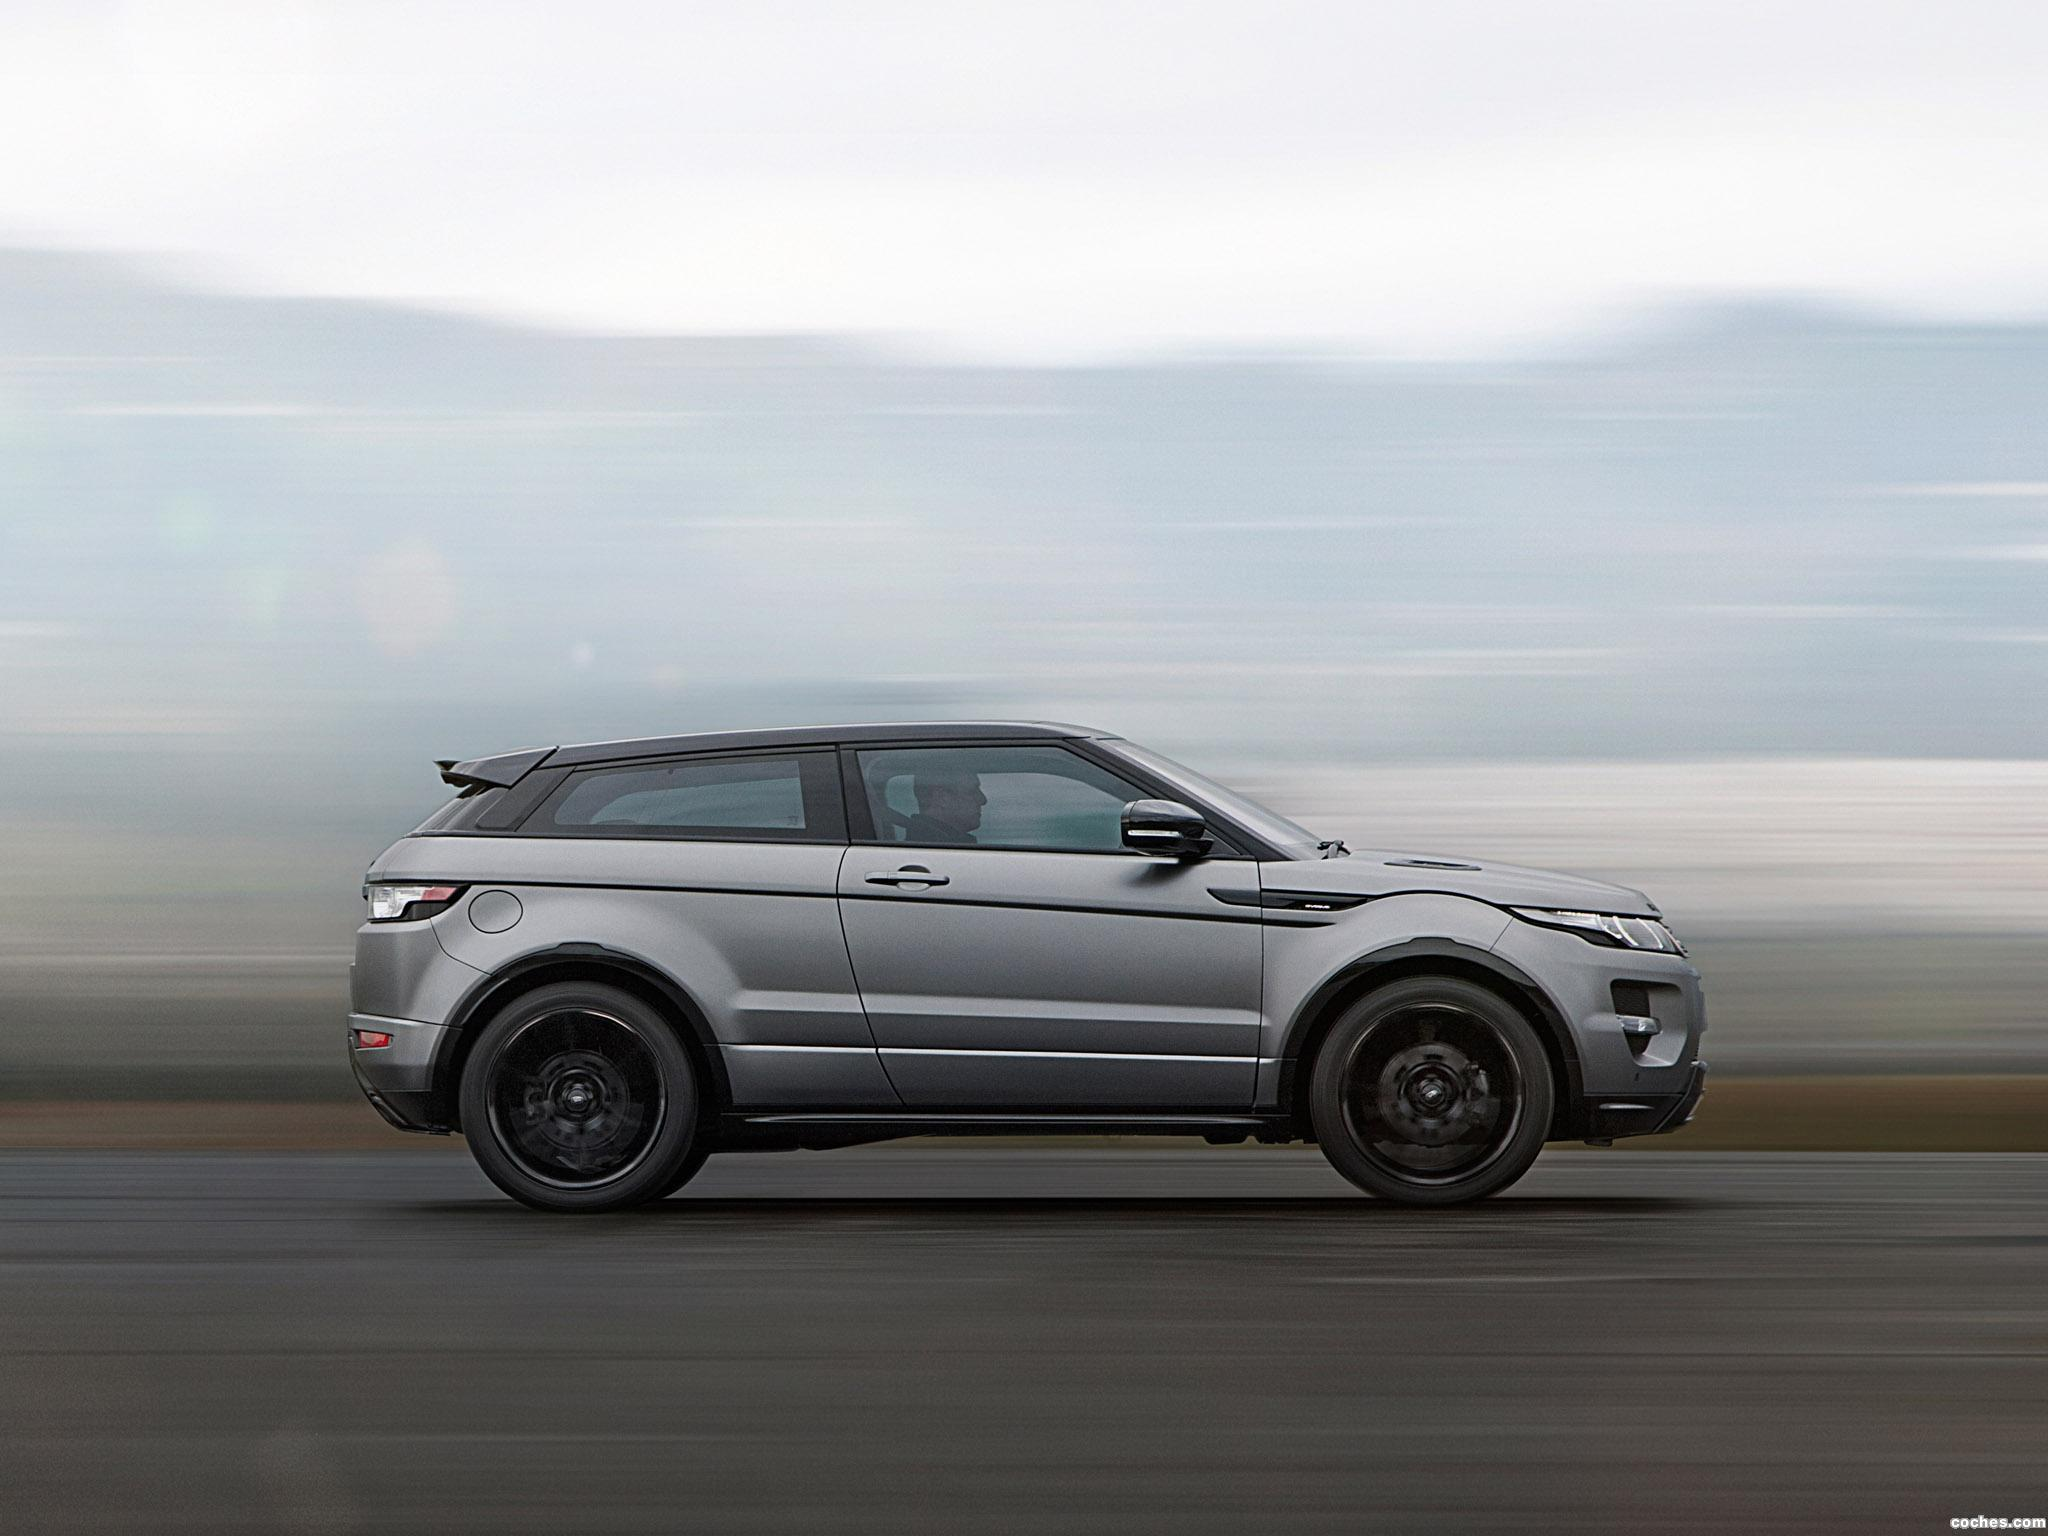 Foto 3 de Range Rover Evoque Victoria Beckham 2012